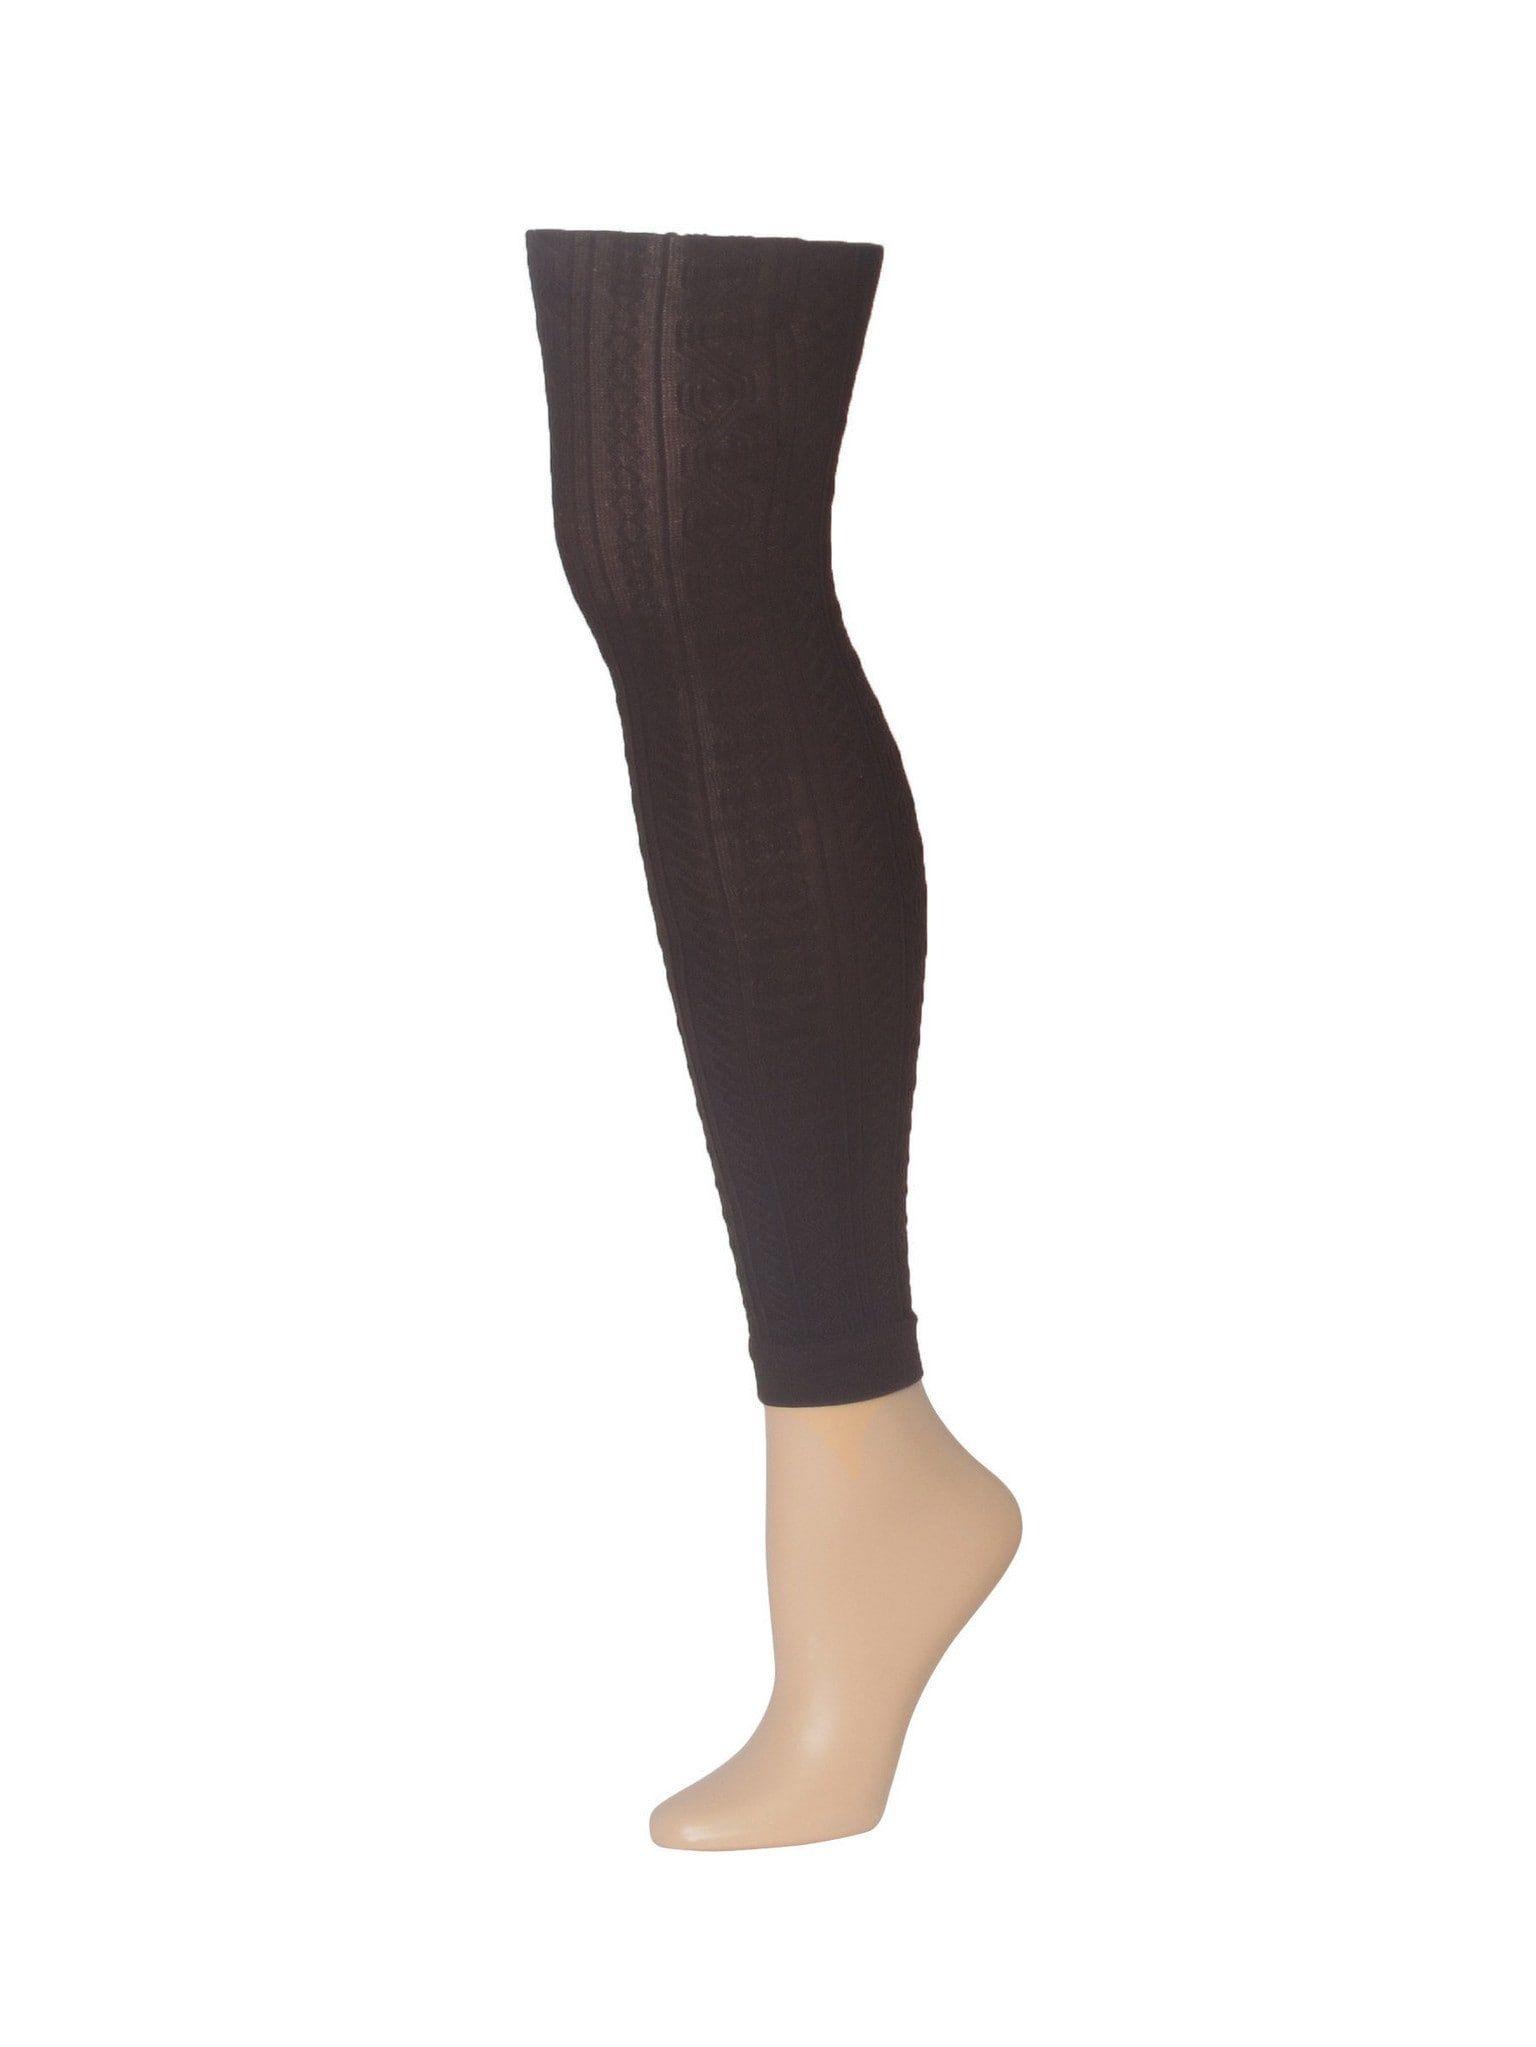 46f9a1fd80a7f MeMoi Textured Footless Tights MeMoi Women's Tights - Hosiery - Pantyhose  Queen1/Queen2 / Black MO 323#Tights, #Women, #Hosiery